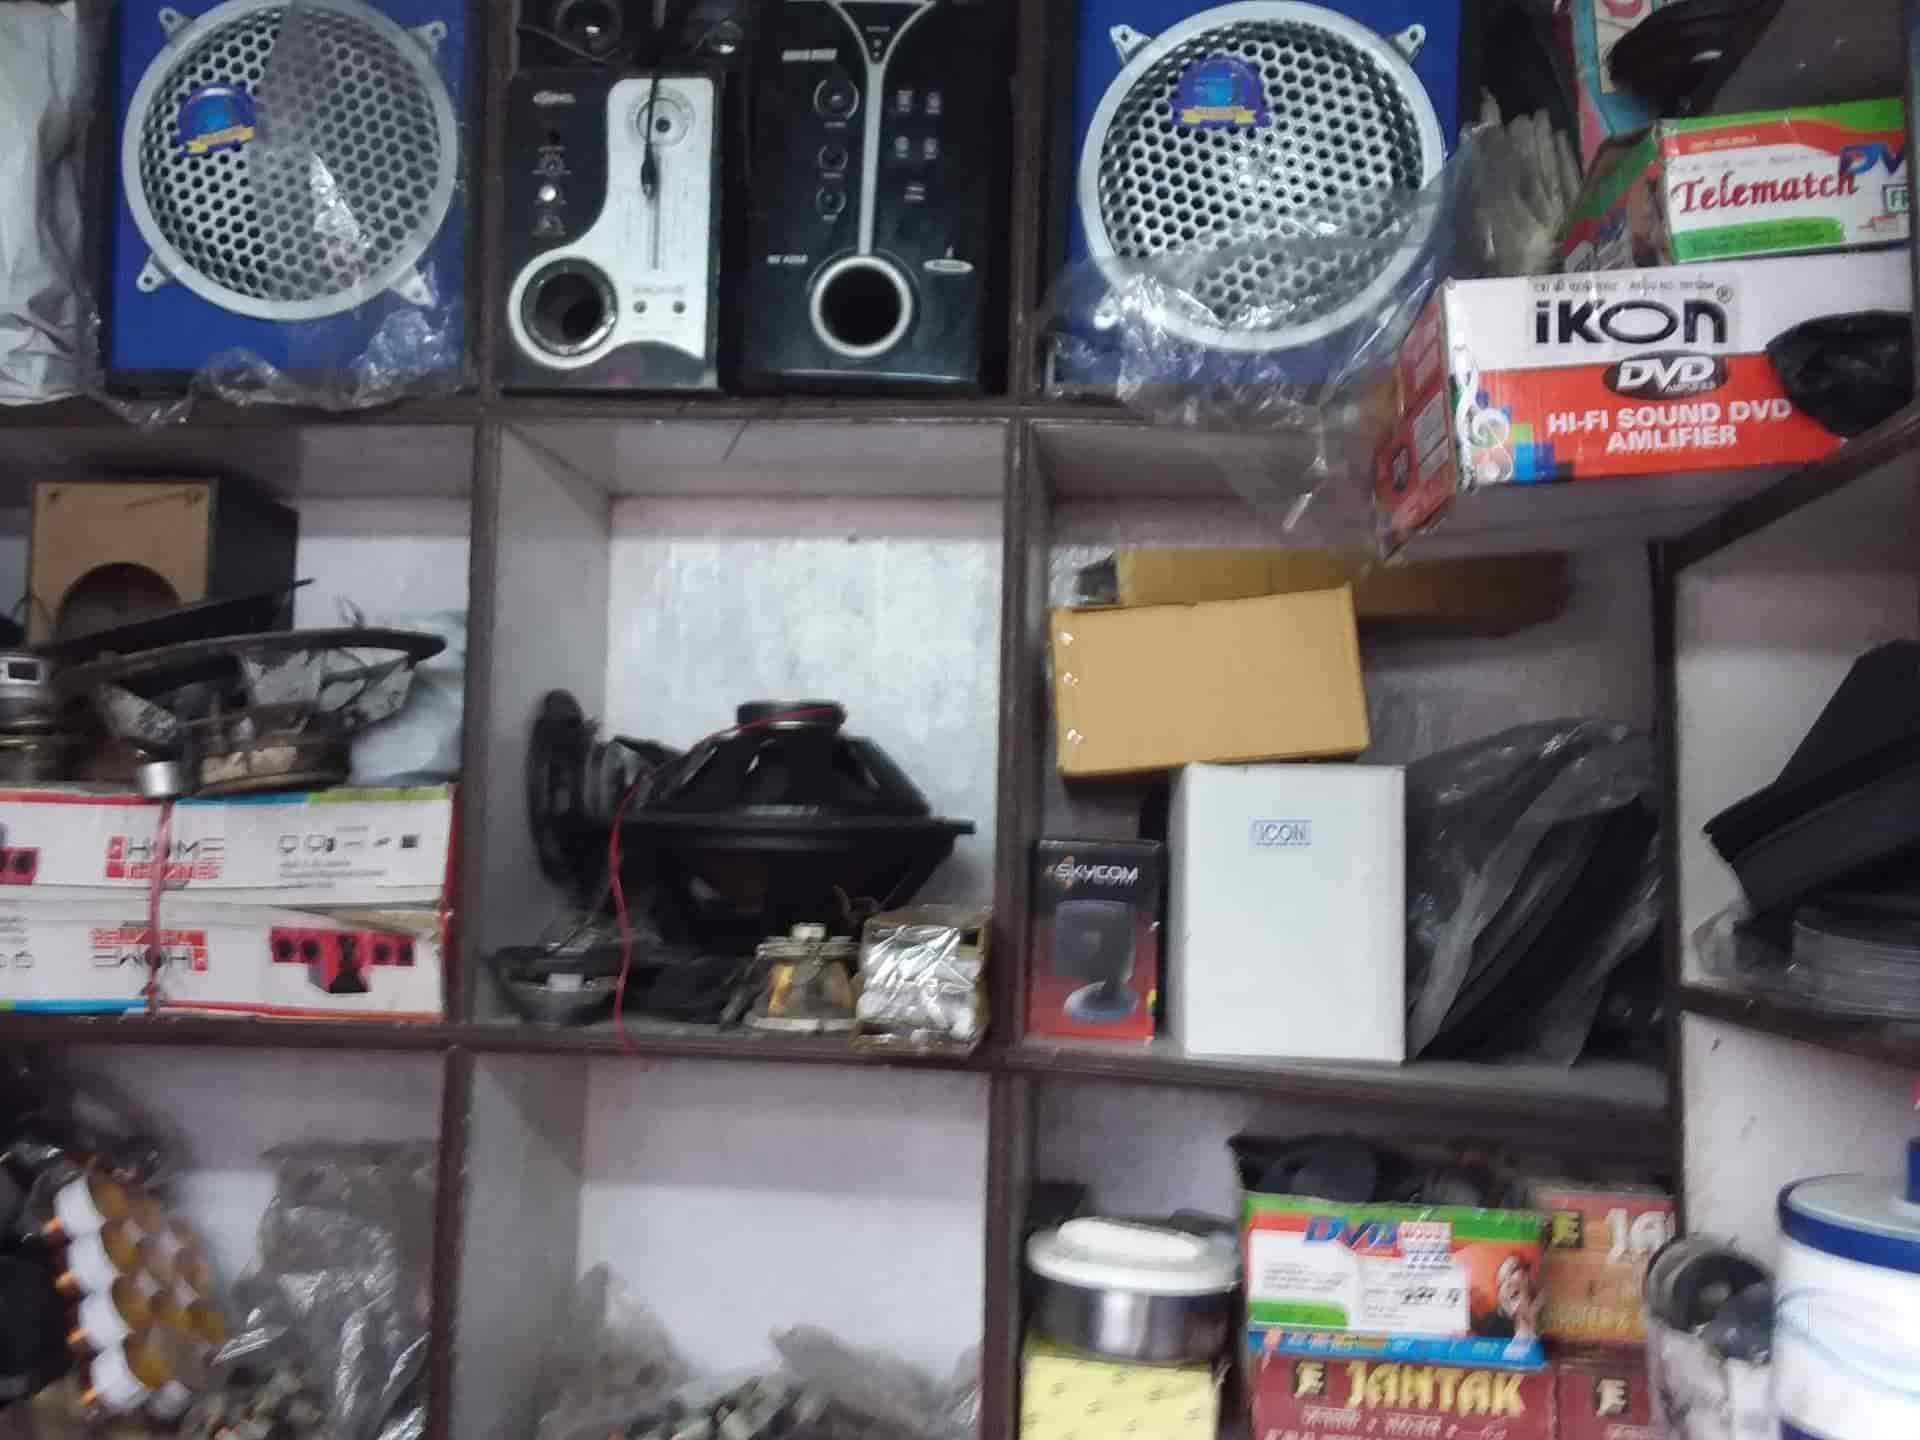 Ustad Electronics & Speaker Repair, Noida Sector 5 - Audio